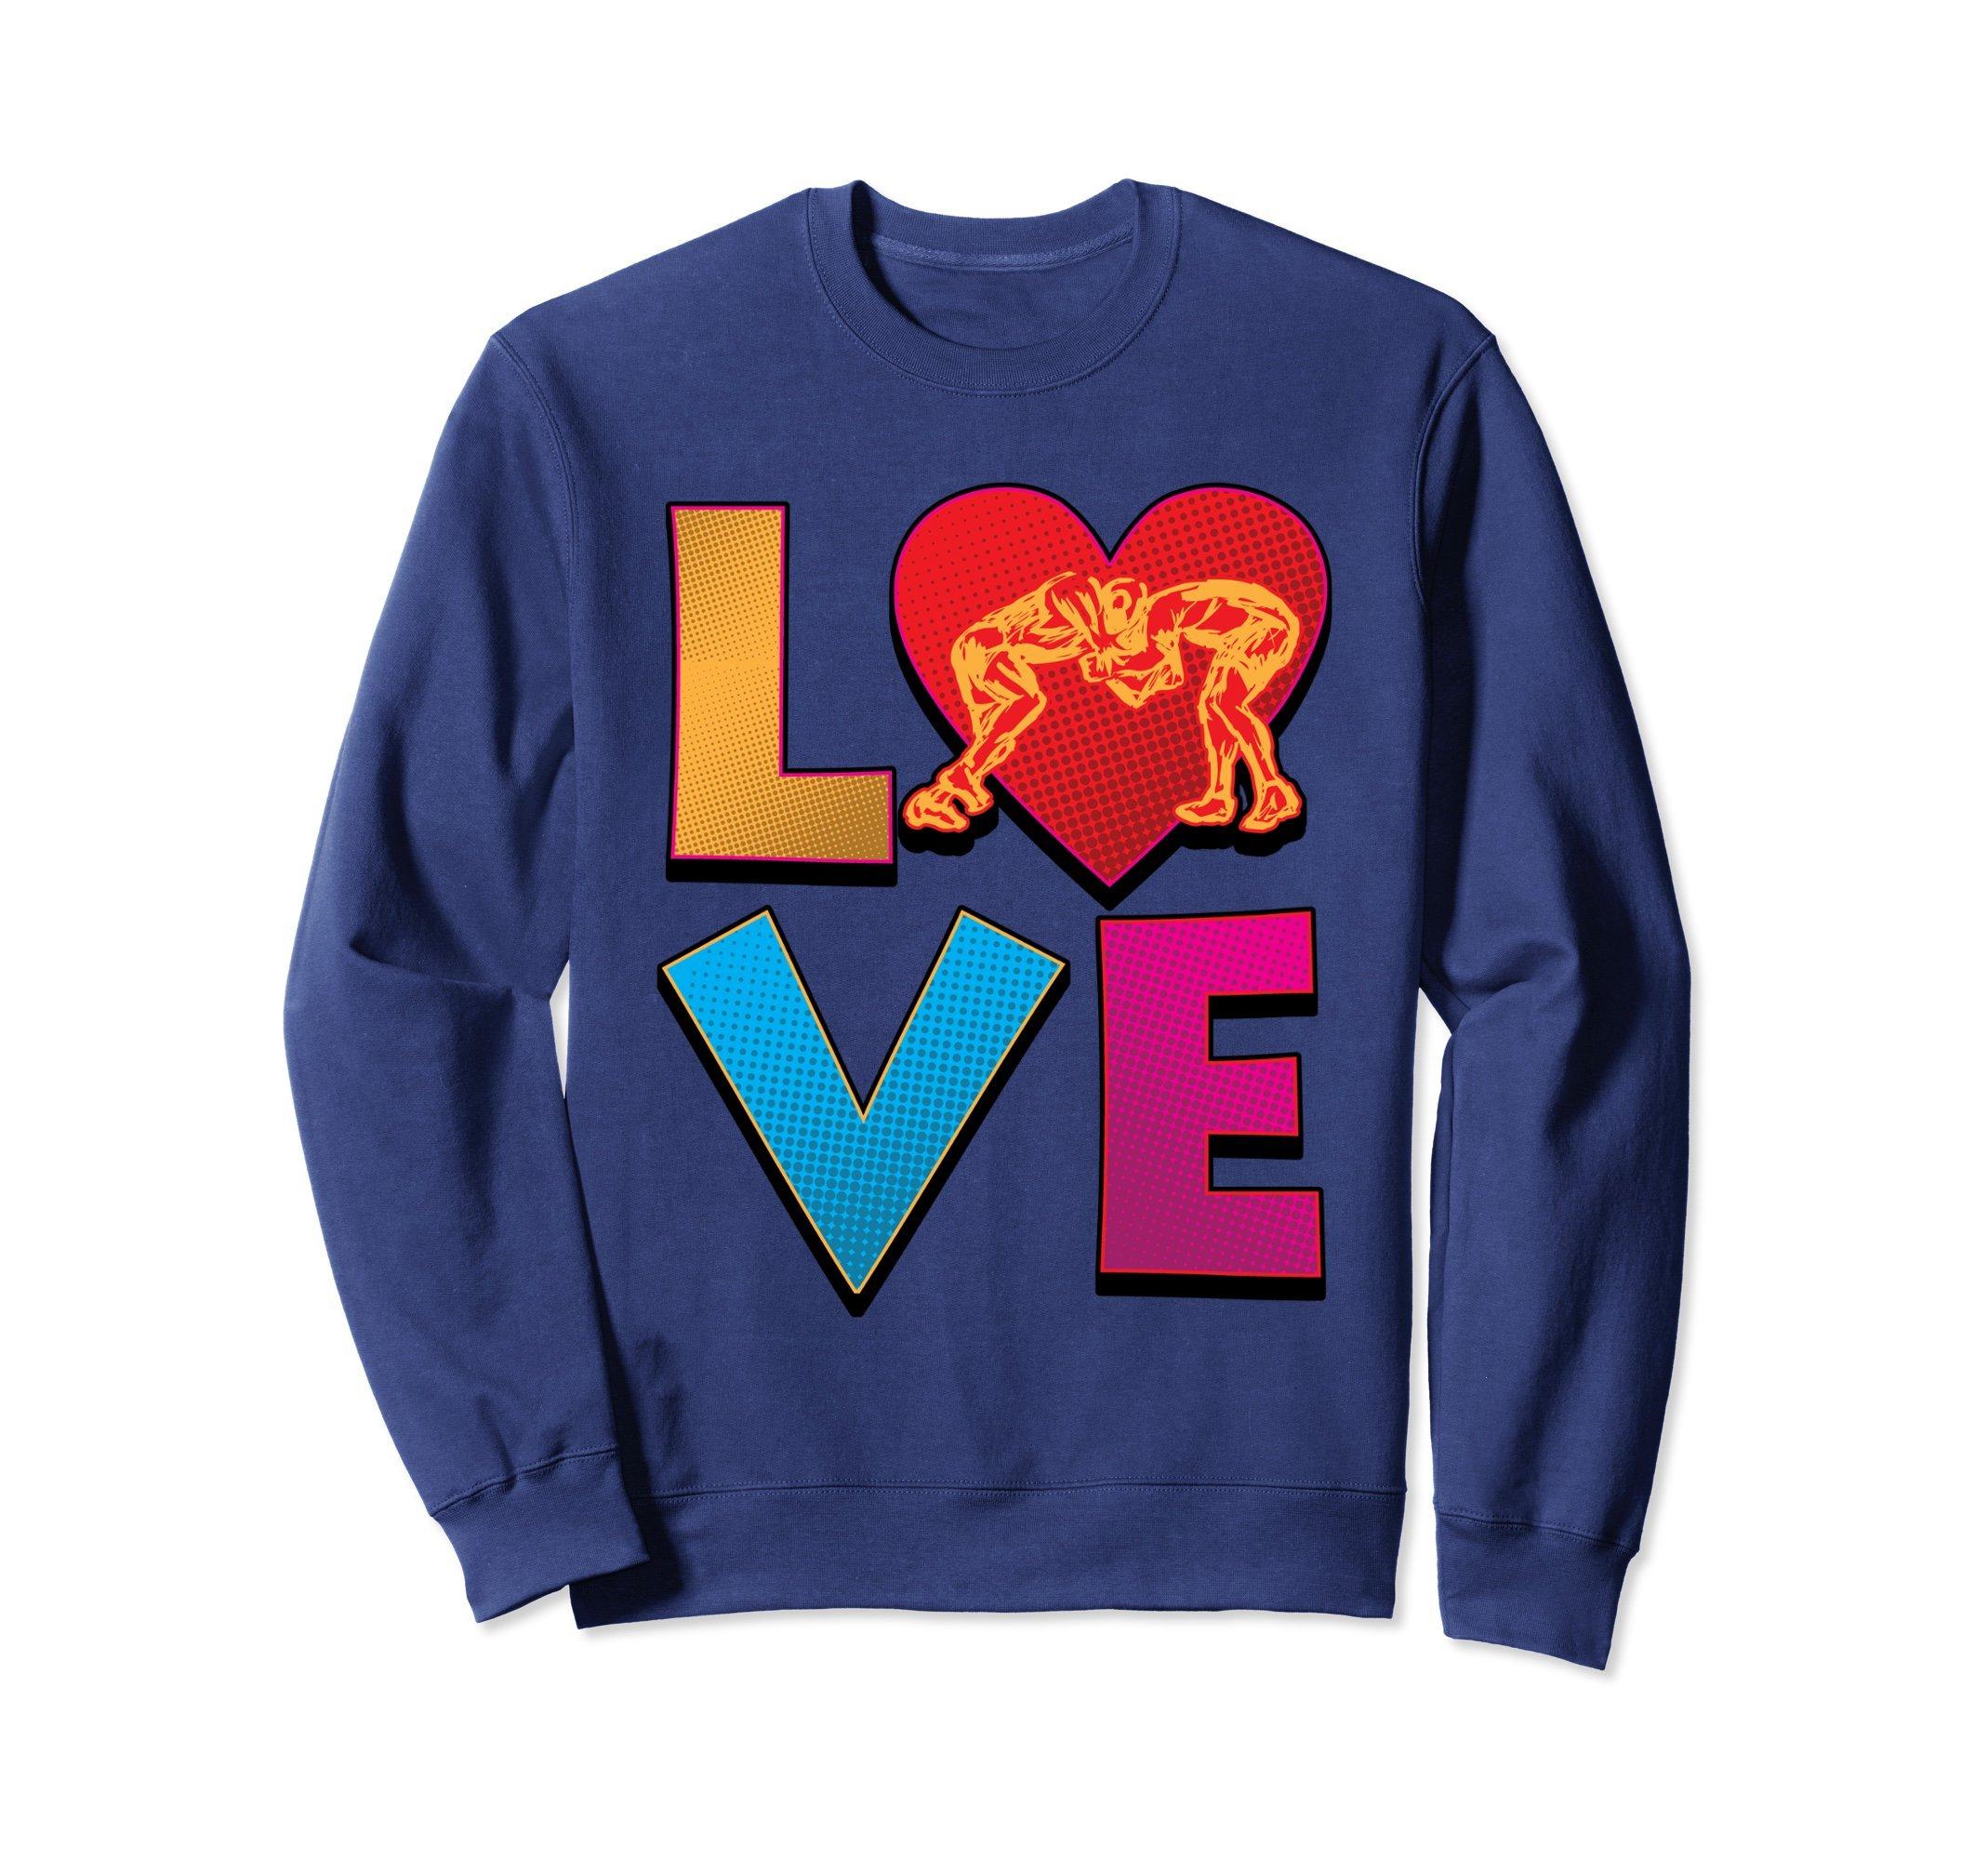 Unisex Wrestling Sweatshirt - Love Wrestling Heart Design Sweater Large Navy by Wrestling Shirt by Crush Retro